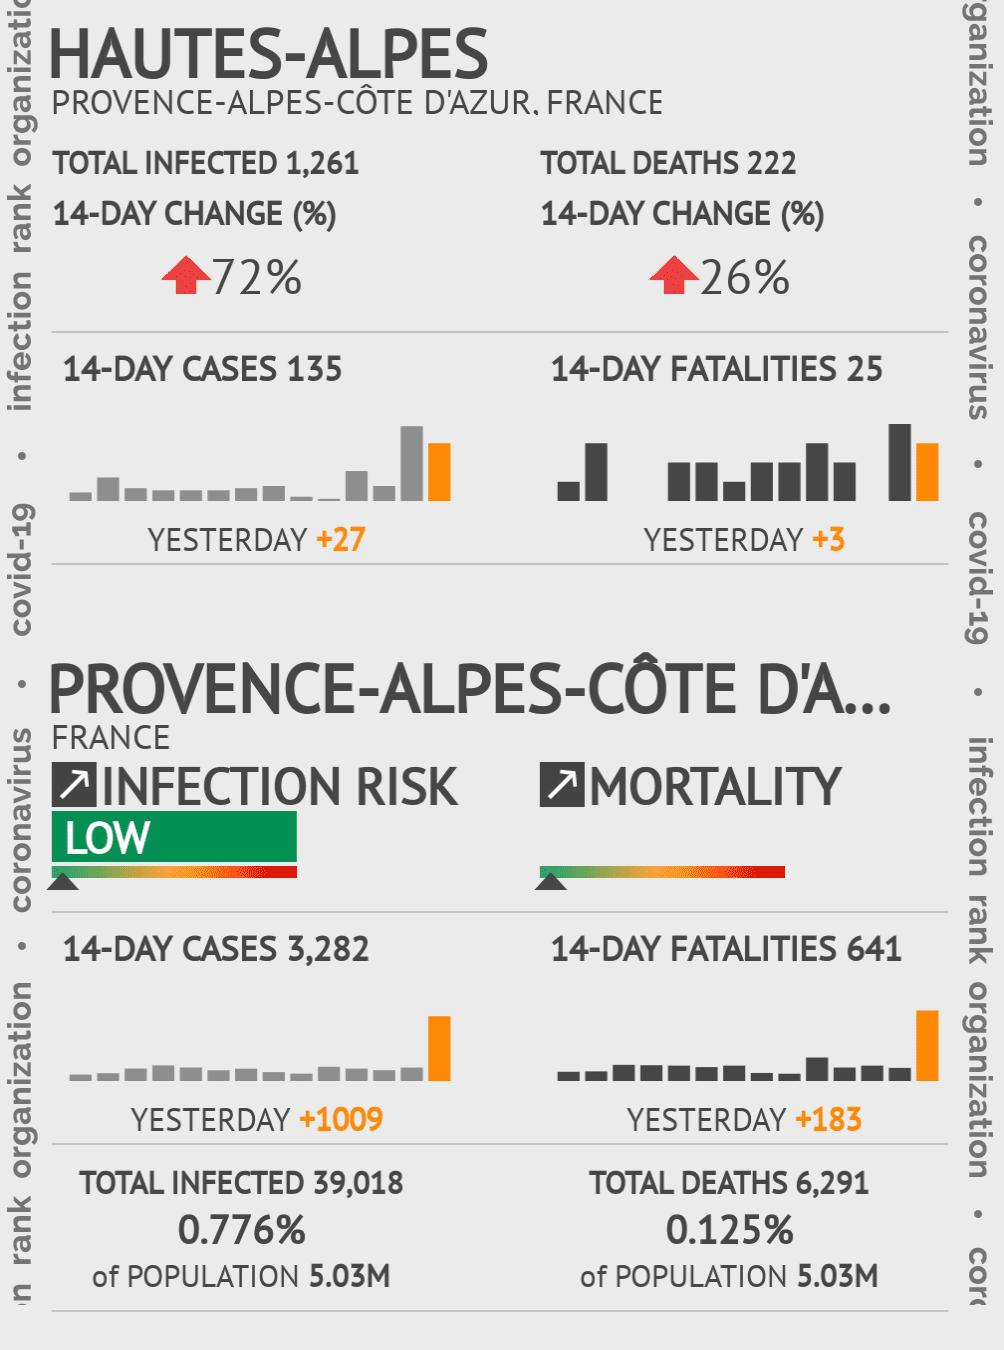 Hautes-Alpes Coronavirus Covid-19 Risk of Infection on February 28, 2021